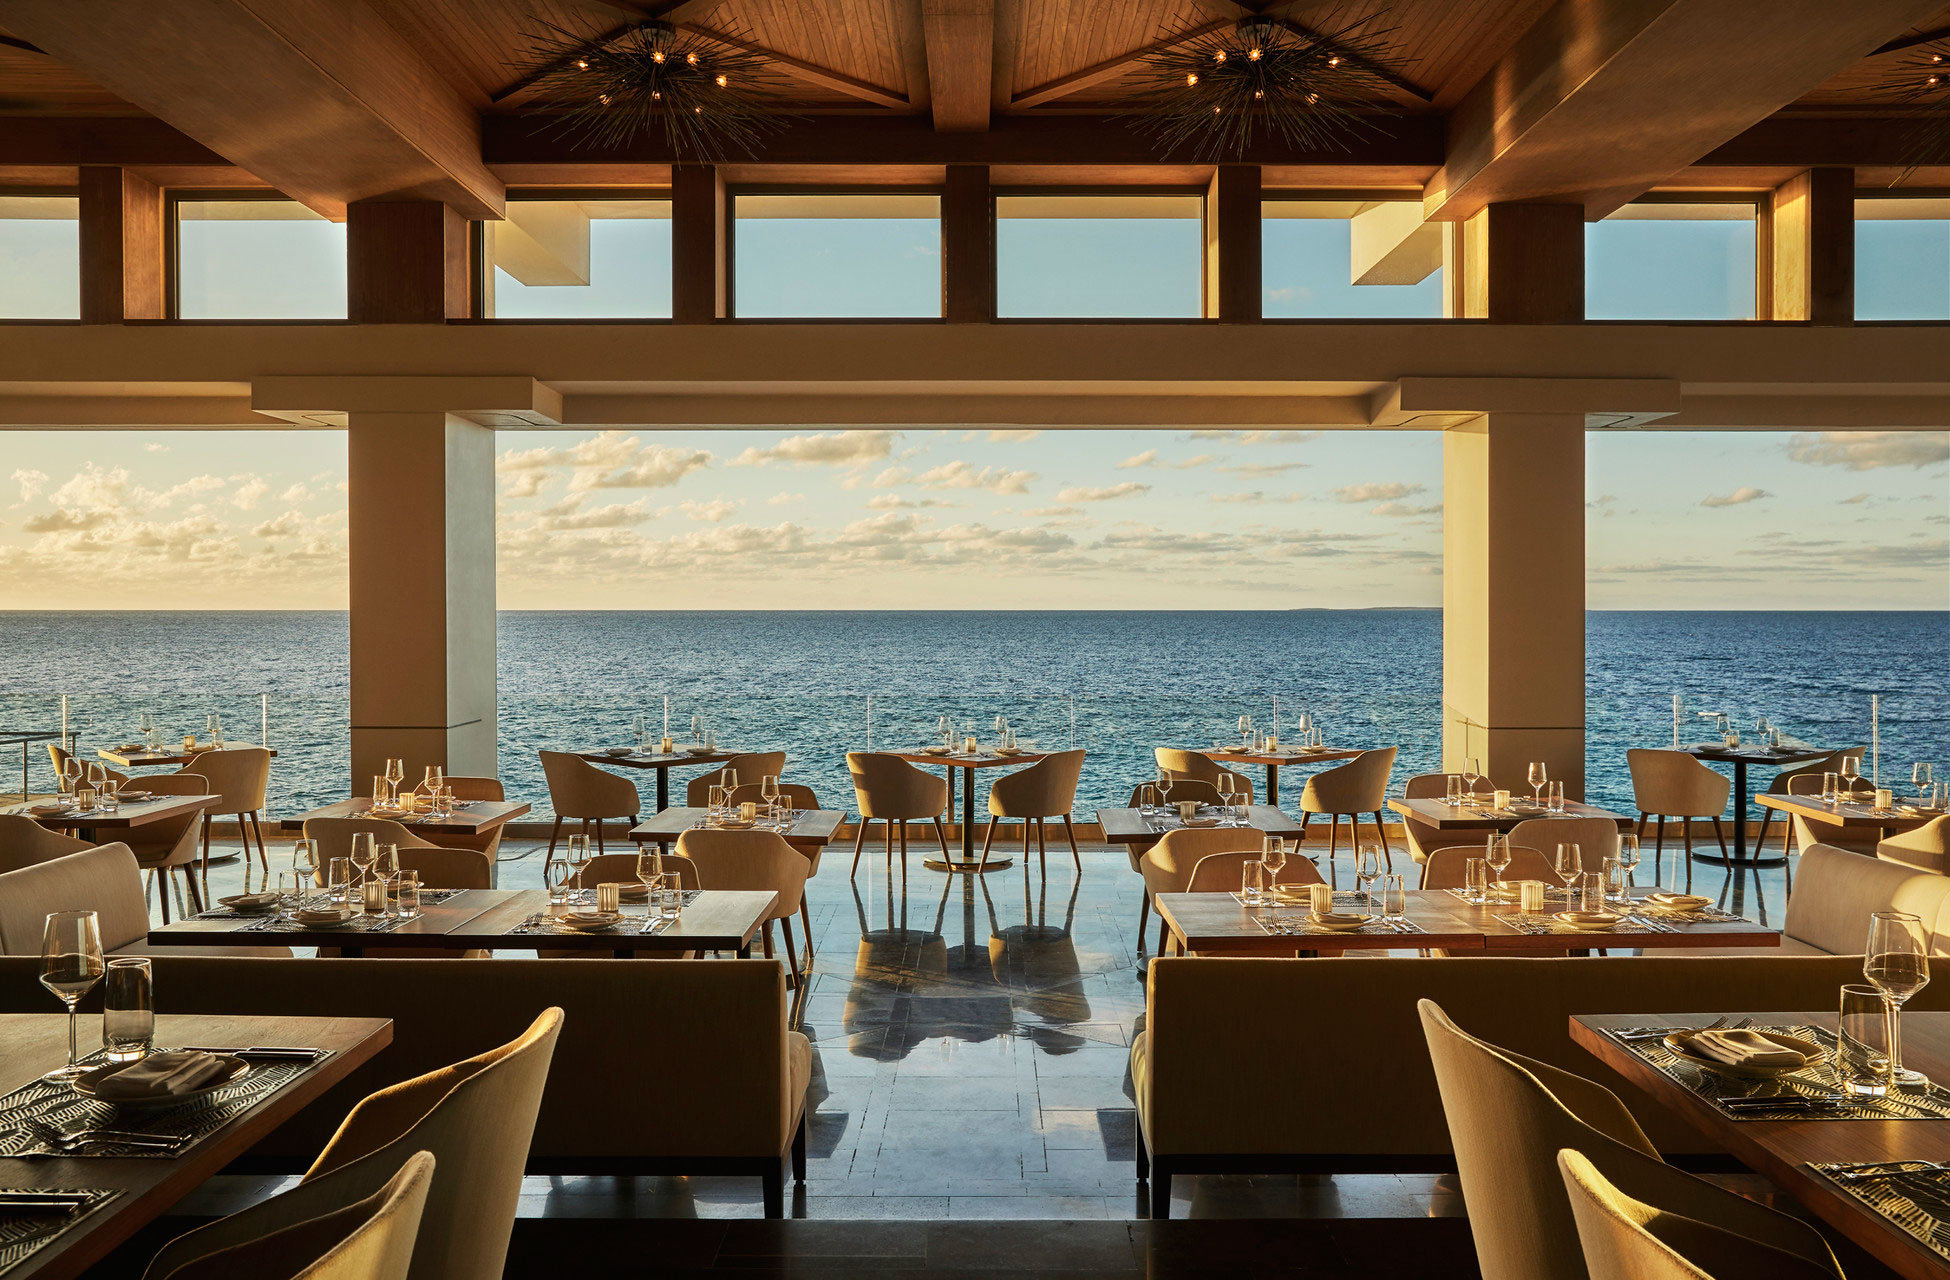 chair restaurant yacht passenger ship Resort Boat luxury yacht function hall Island